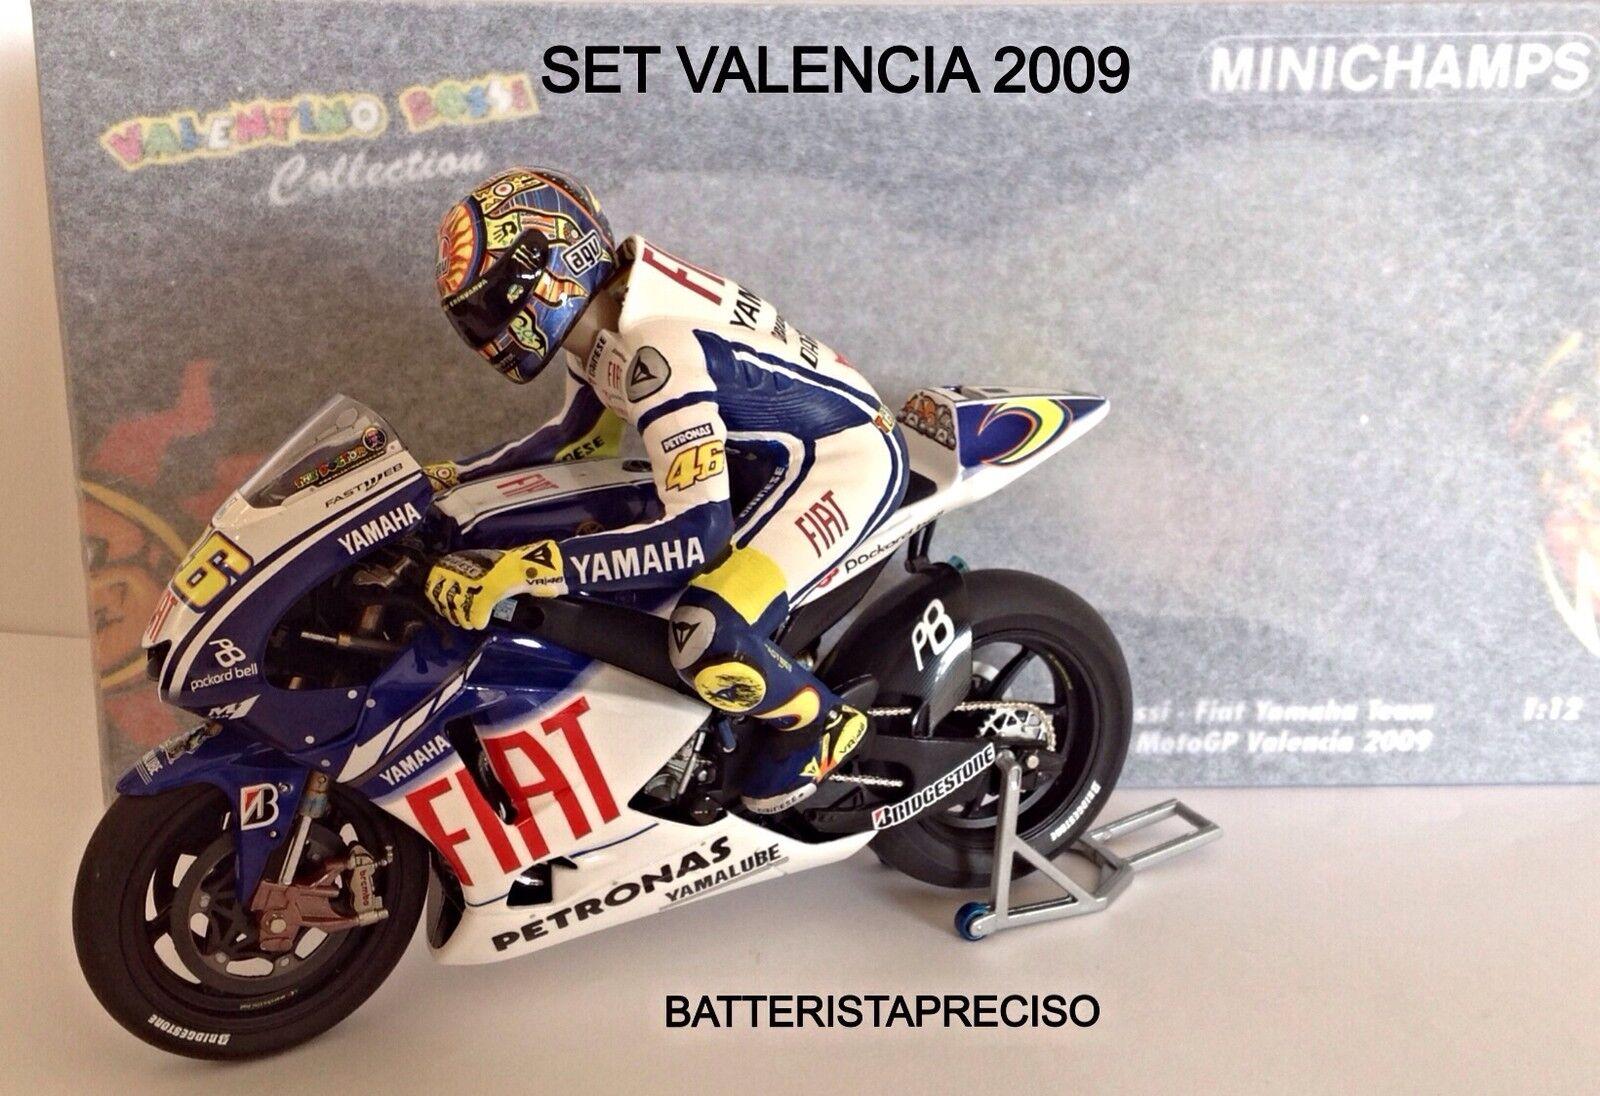 MINICHAMPS VALENTINO ROSSI 1 12 SET GP VALENCIA 2009 WORLD CHAMPION 122093076